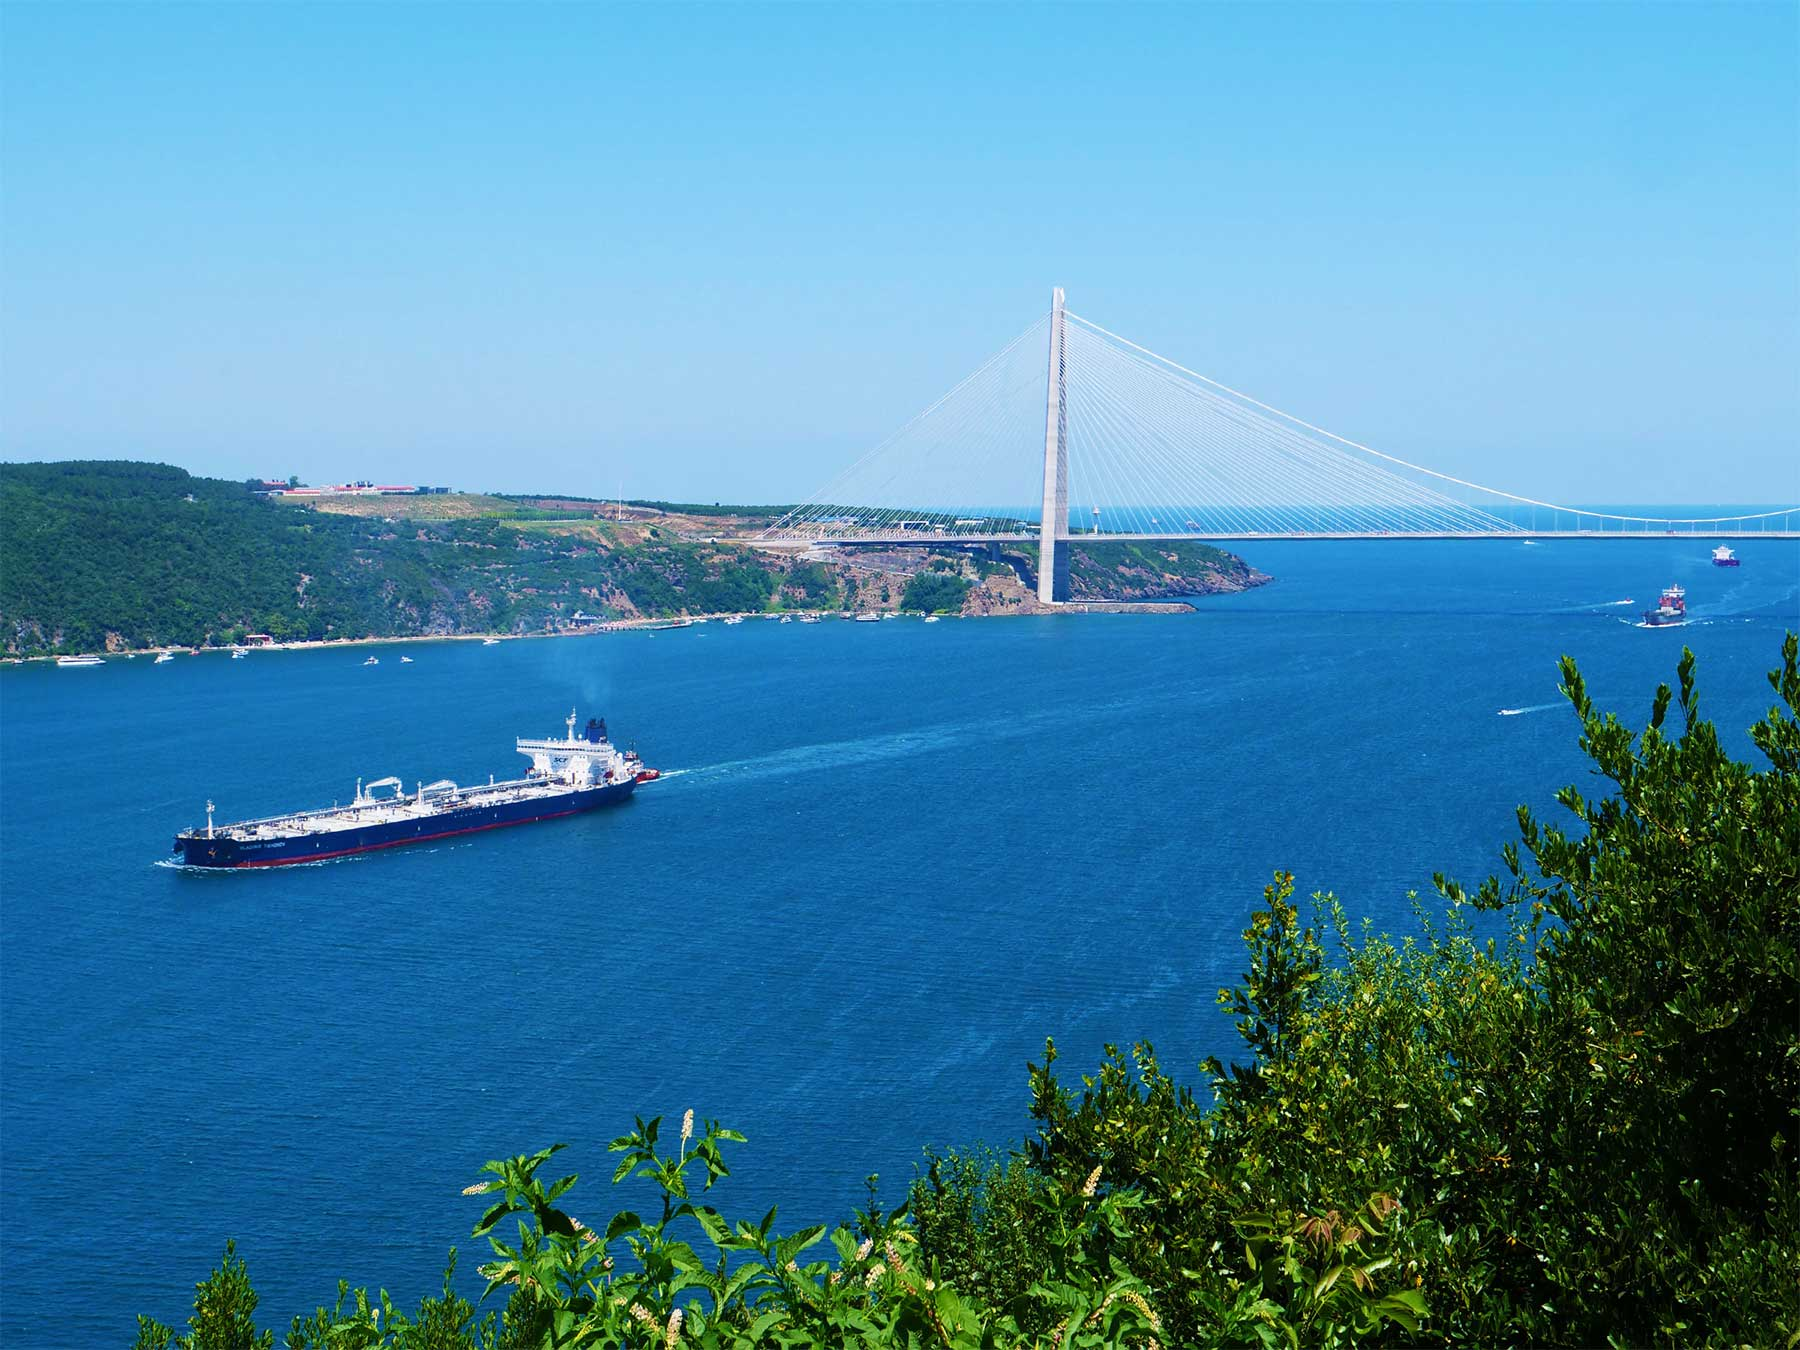 Bosphorus Black Sea Istanbul Turkey | Photo Dr Steven Andrew Martin | Teaching and Learning Adventures 2019